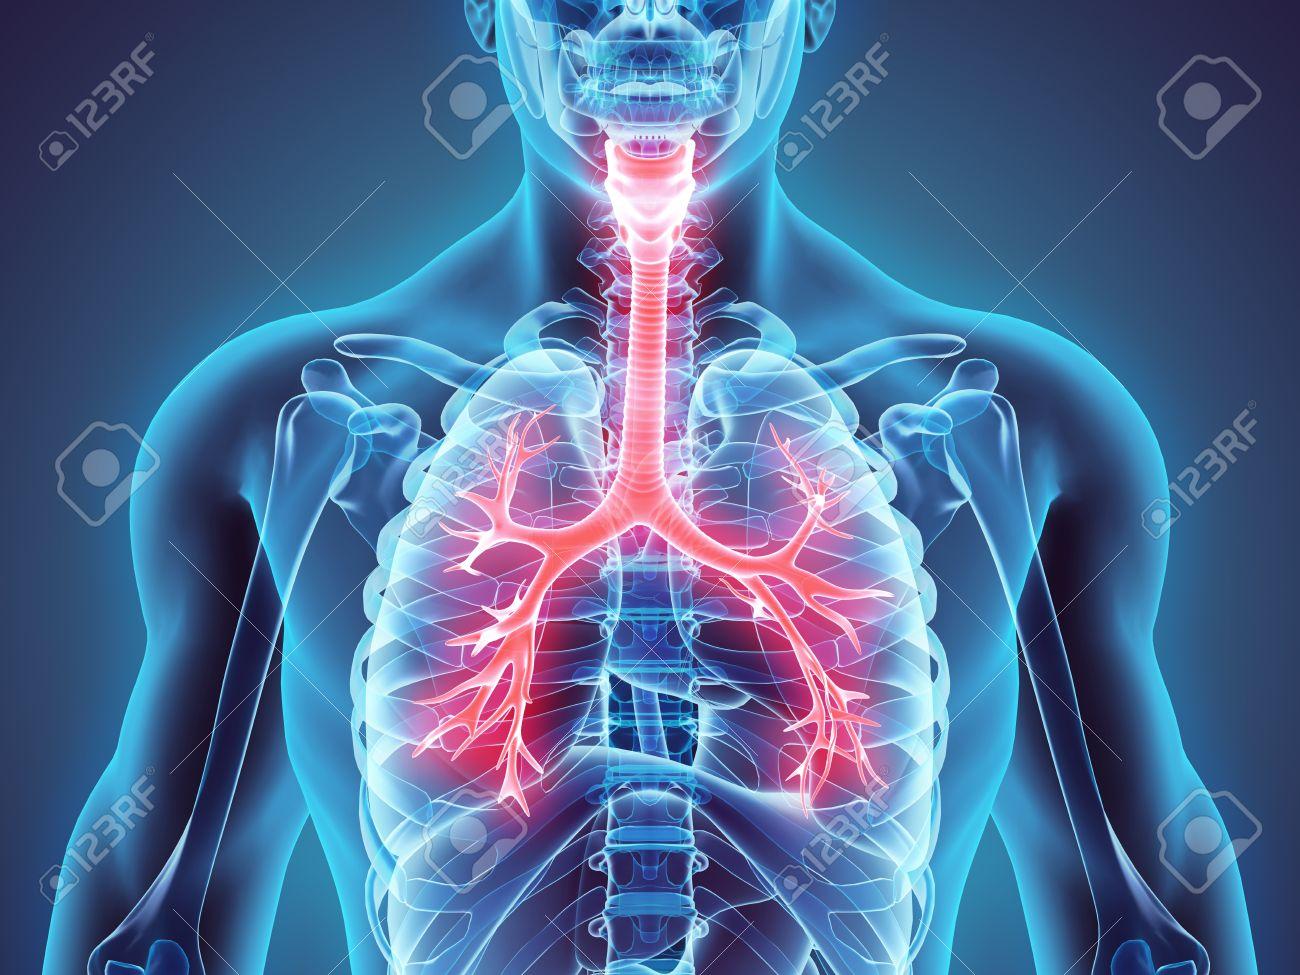 3D illustration of Larynx Trachea Bronchi Part of Respiratory System. - 57876839